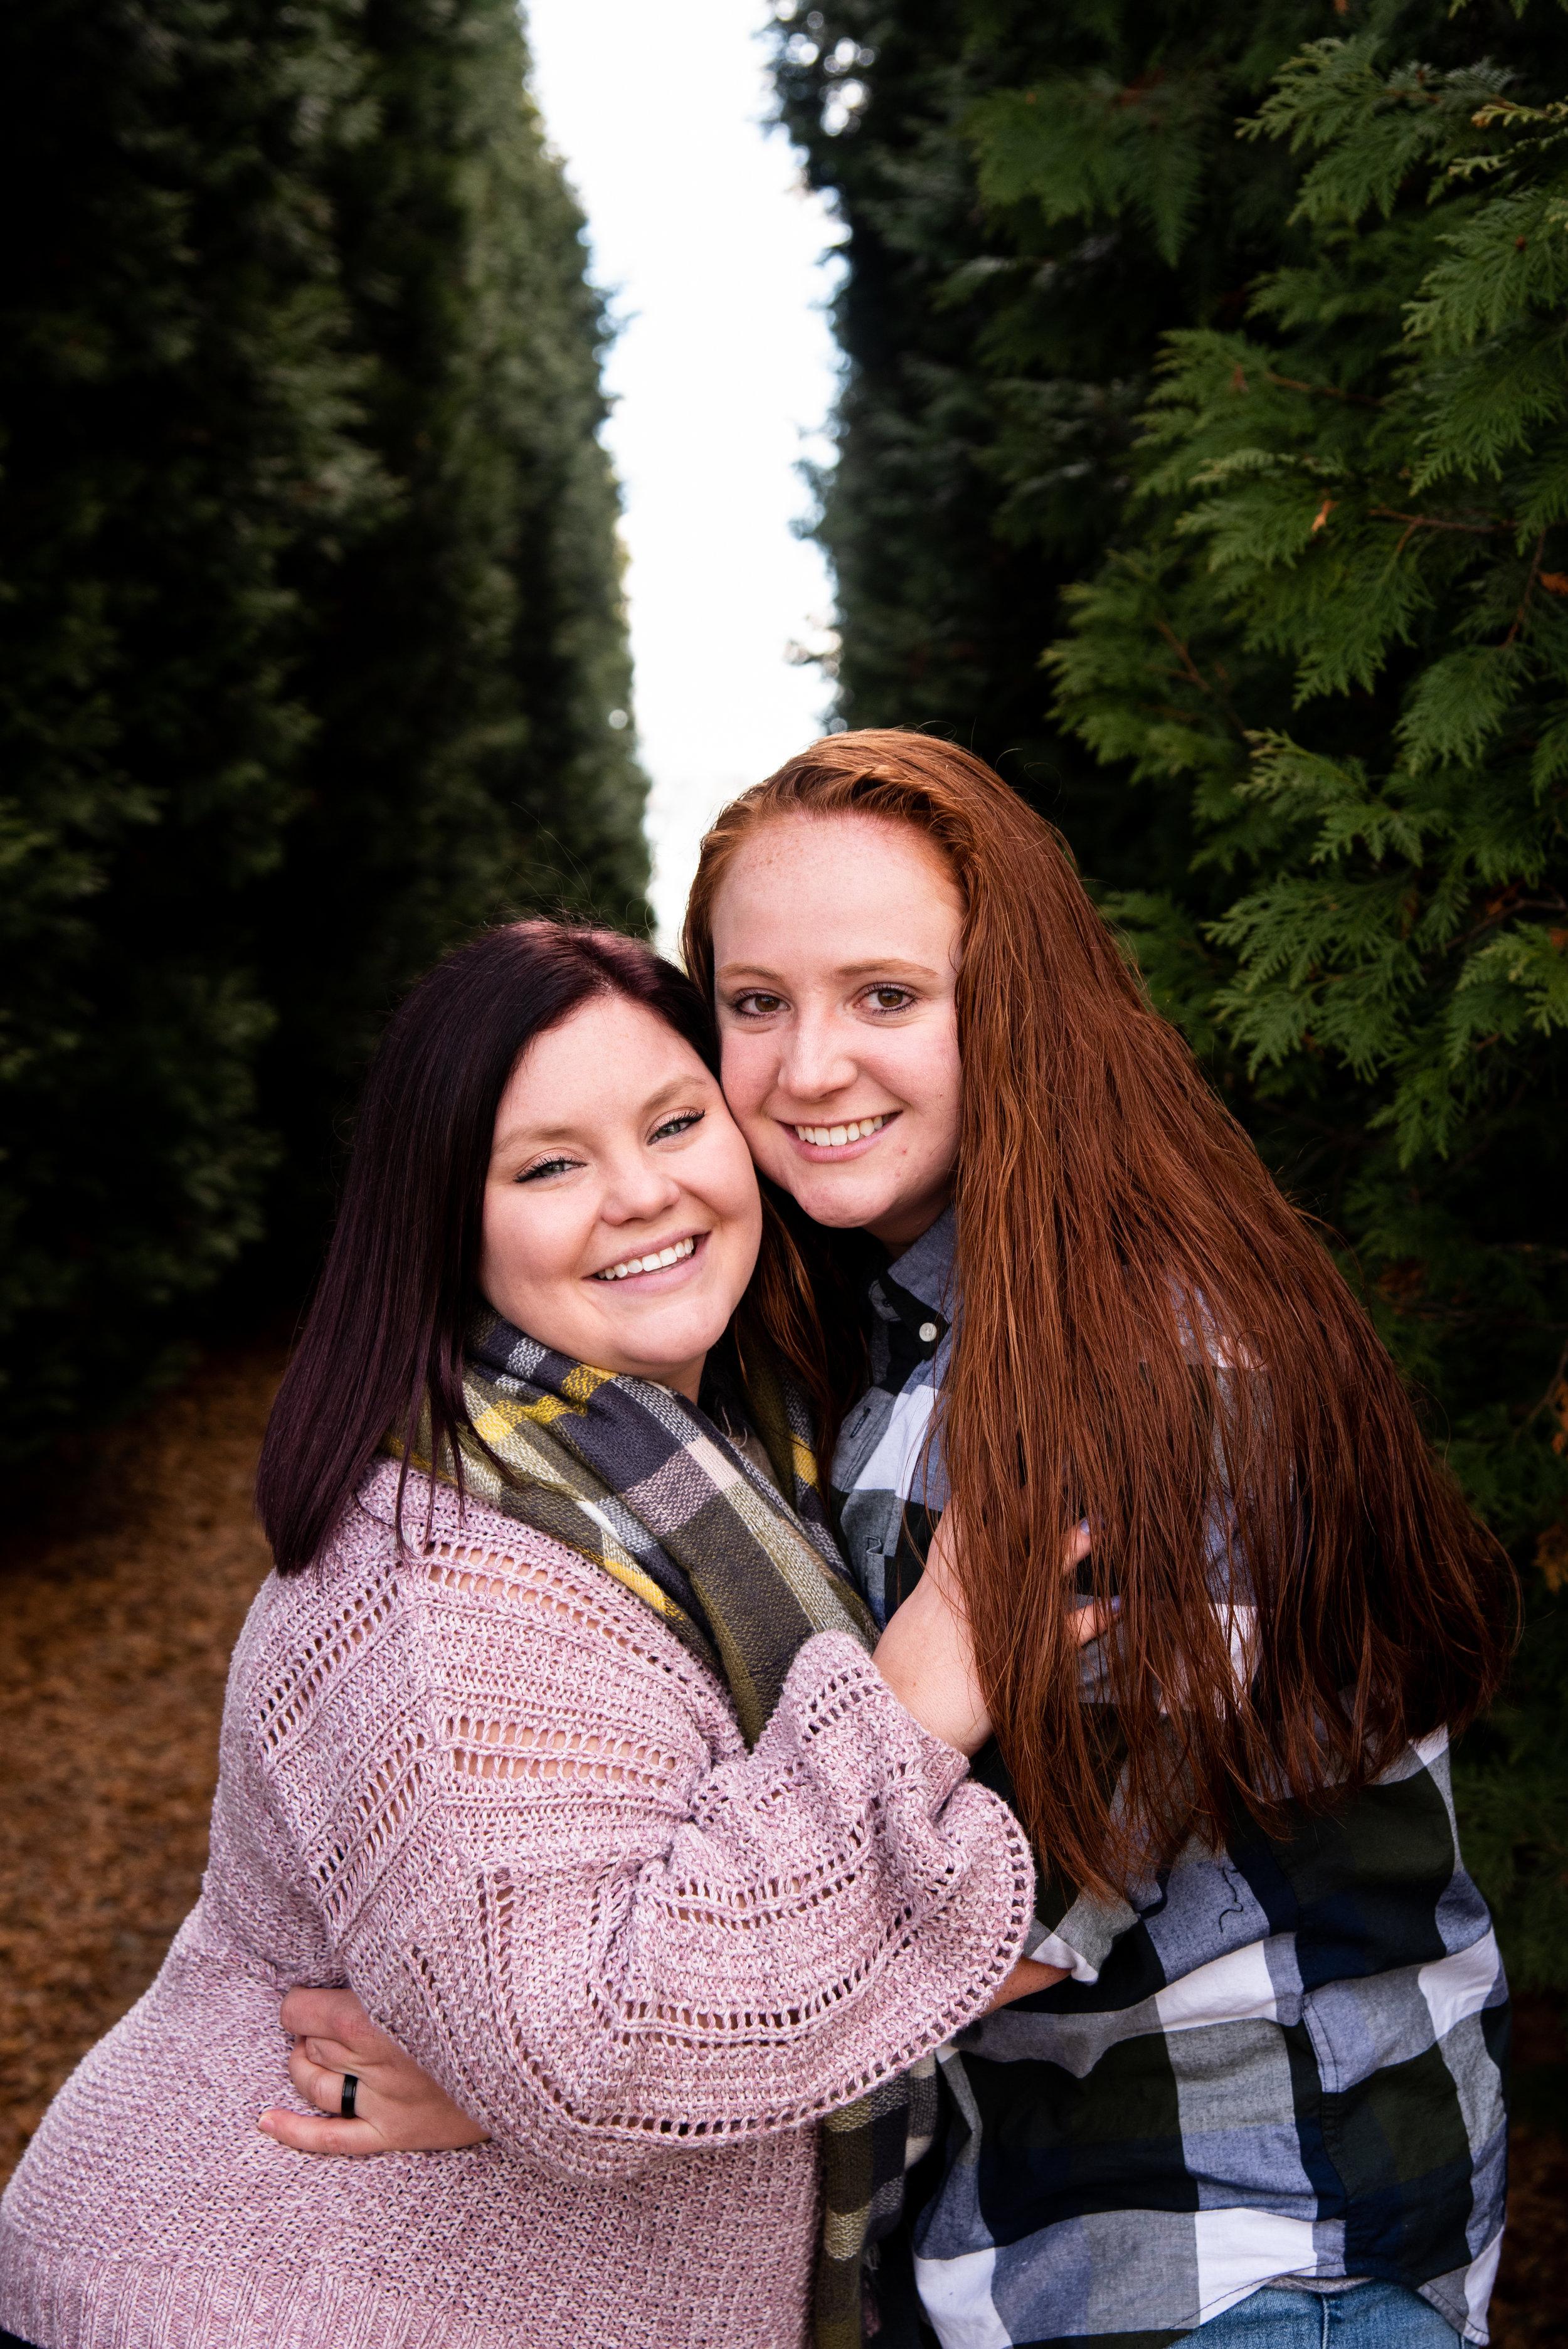 Kyla Jo Photography // Muncie Indiana Photographer // Family Photos // Whitetail Tree Farm // Two Women Photo Shoot // Winter Photo Shoot // Christmas Tree Farm Photo Session